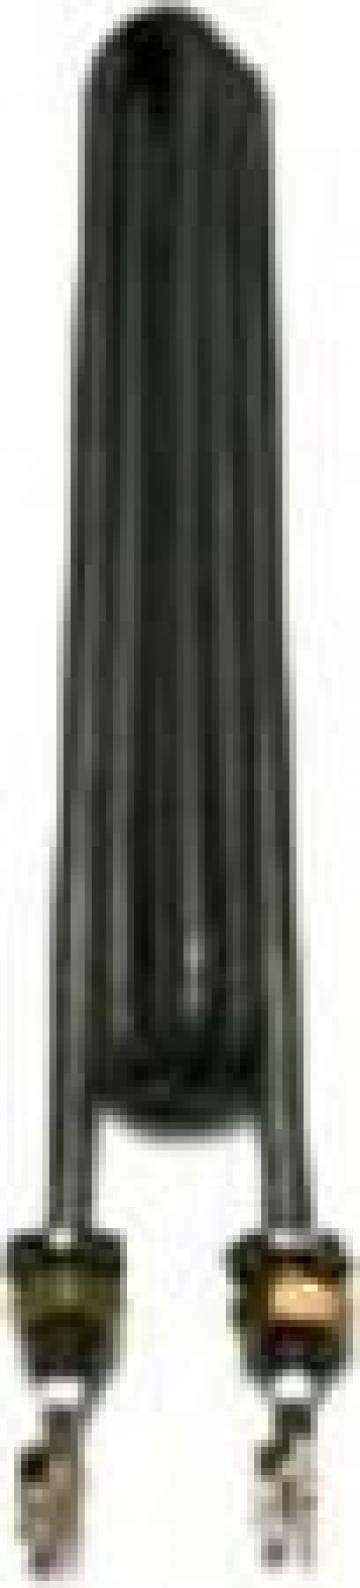 Rezistenta M10, 190mm, 2000W de la Sercotex International Srl